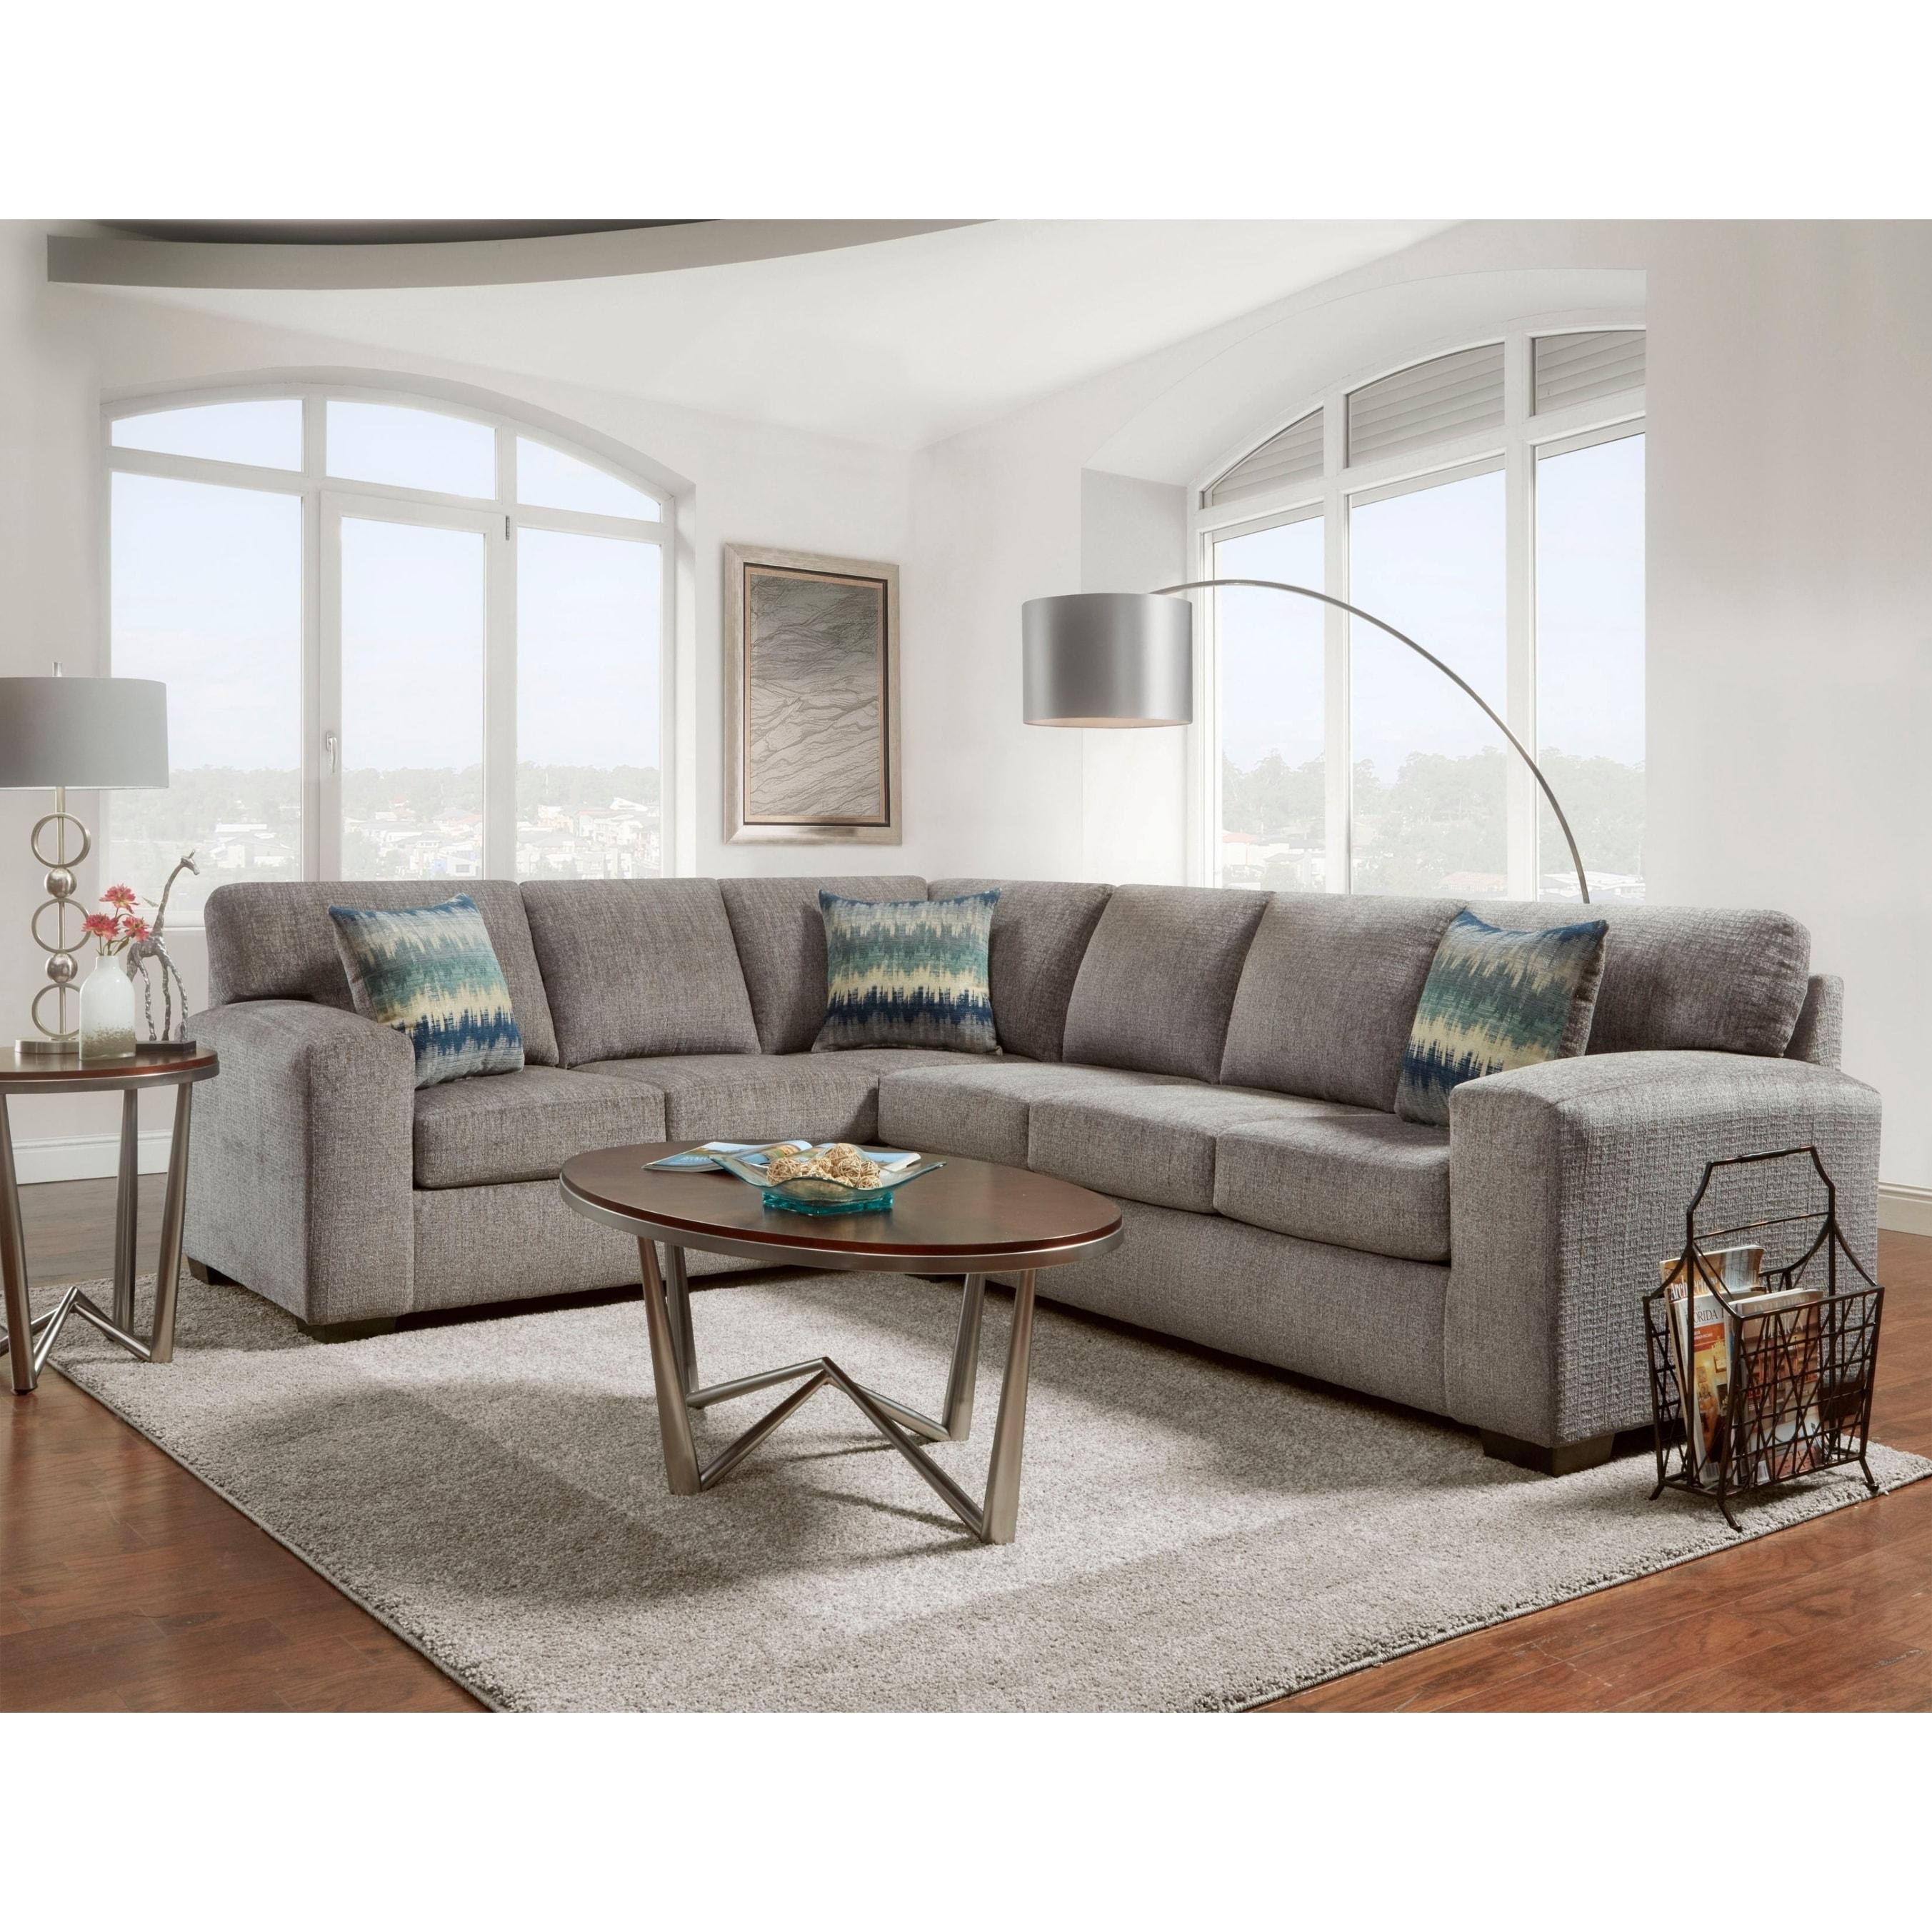 Shop Bergen Silverton Pewter Fabric Sectional Sofa - Free Shipping ...